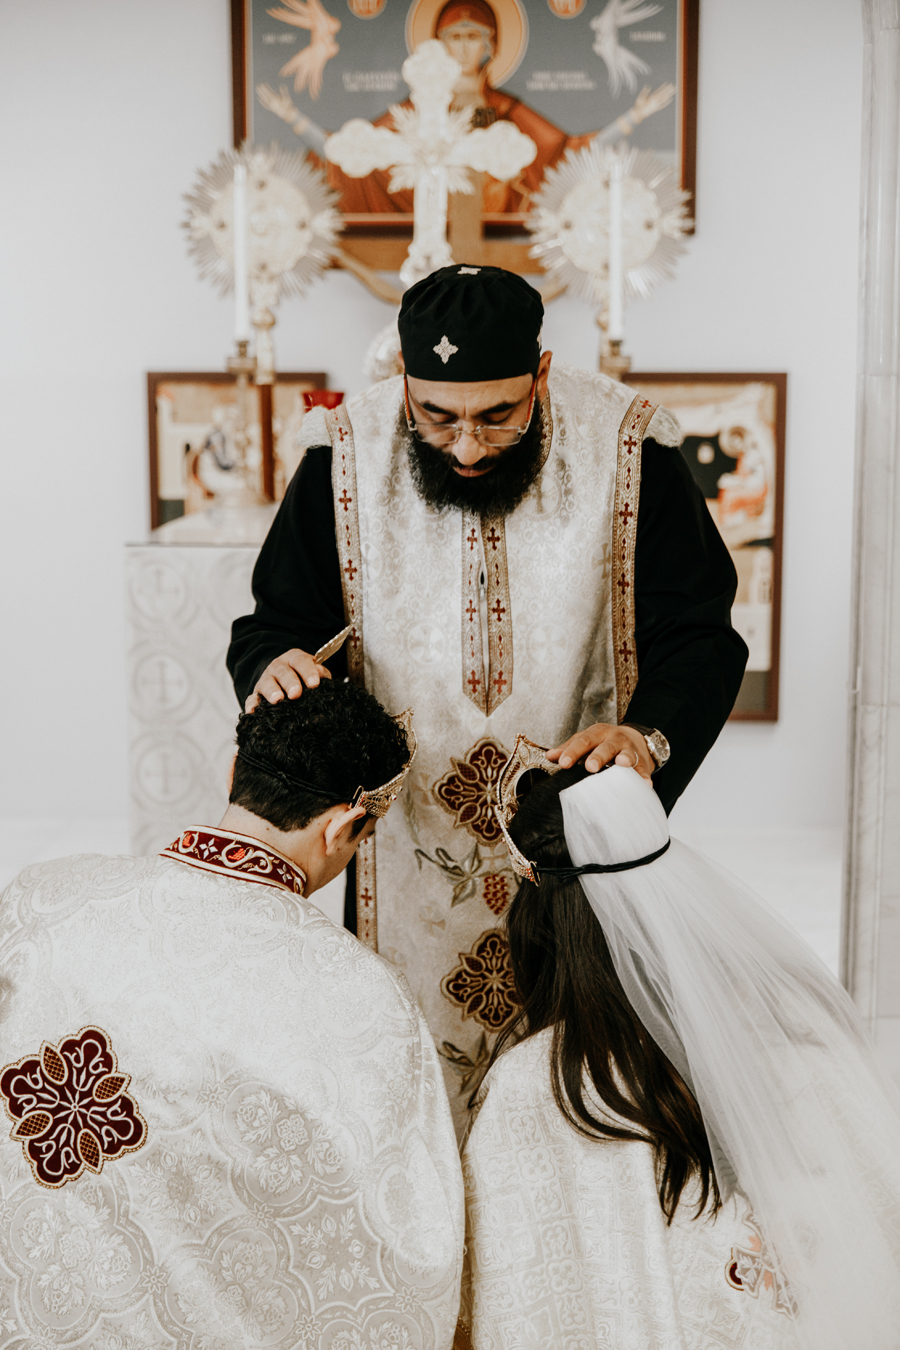 religiousweddingphotos.jpg